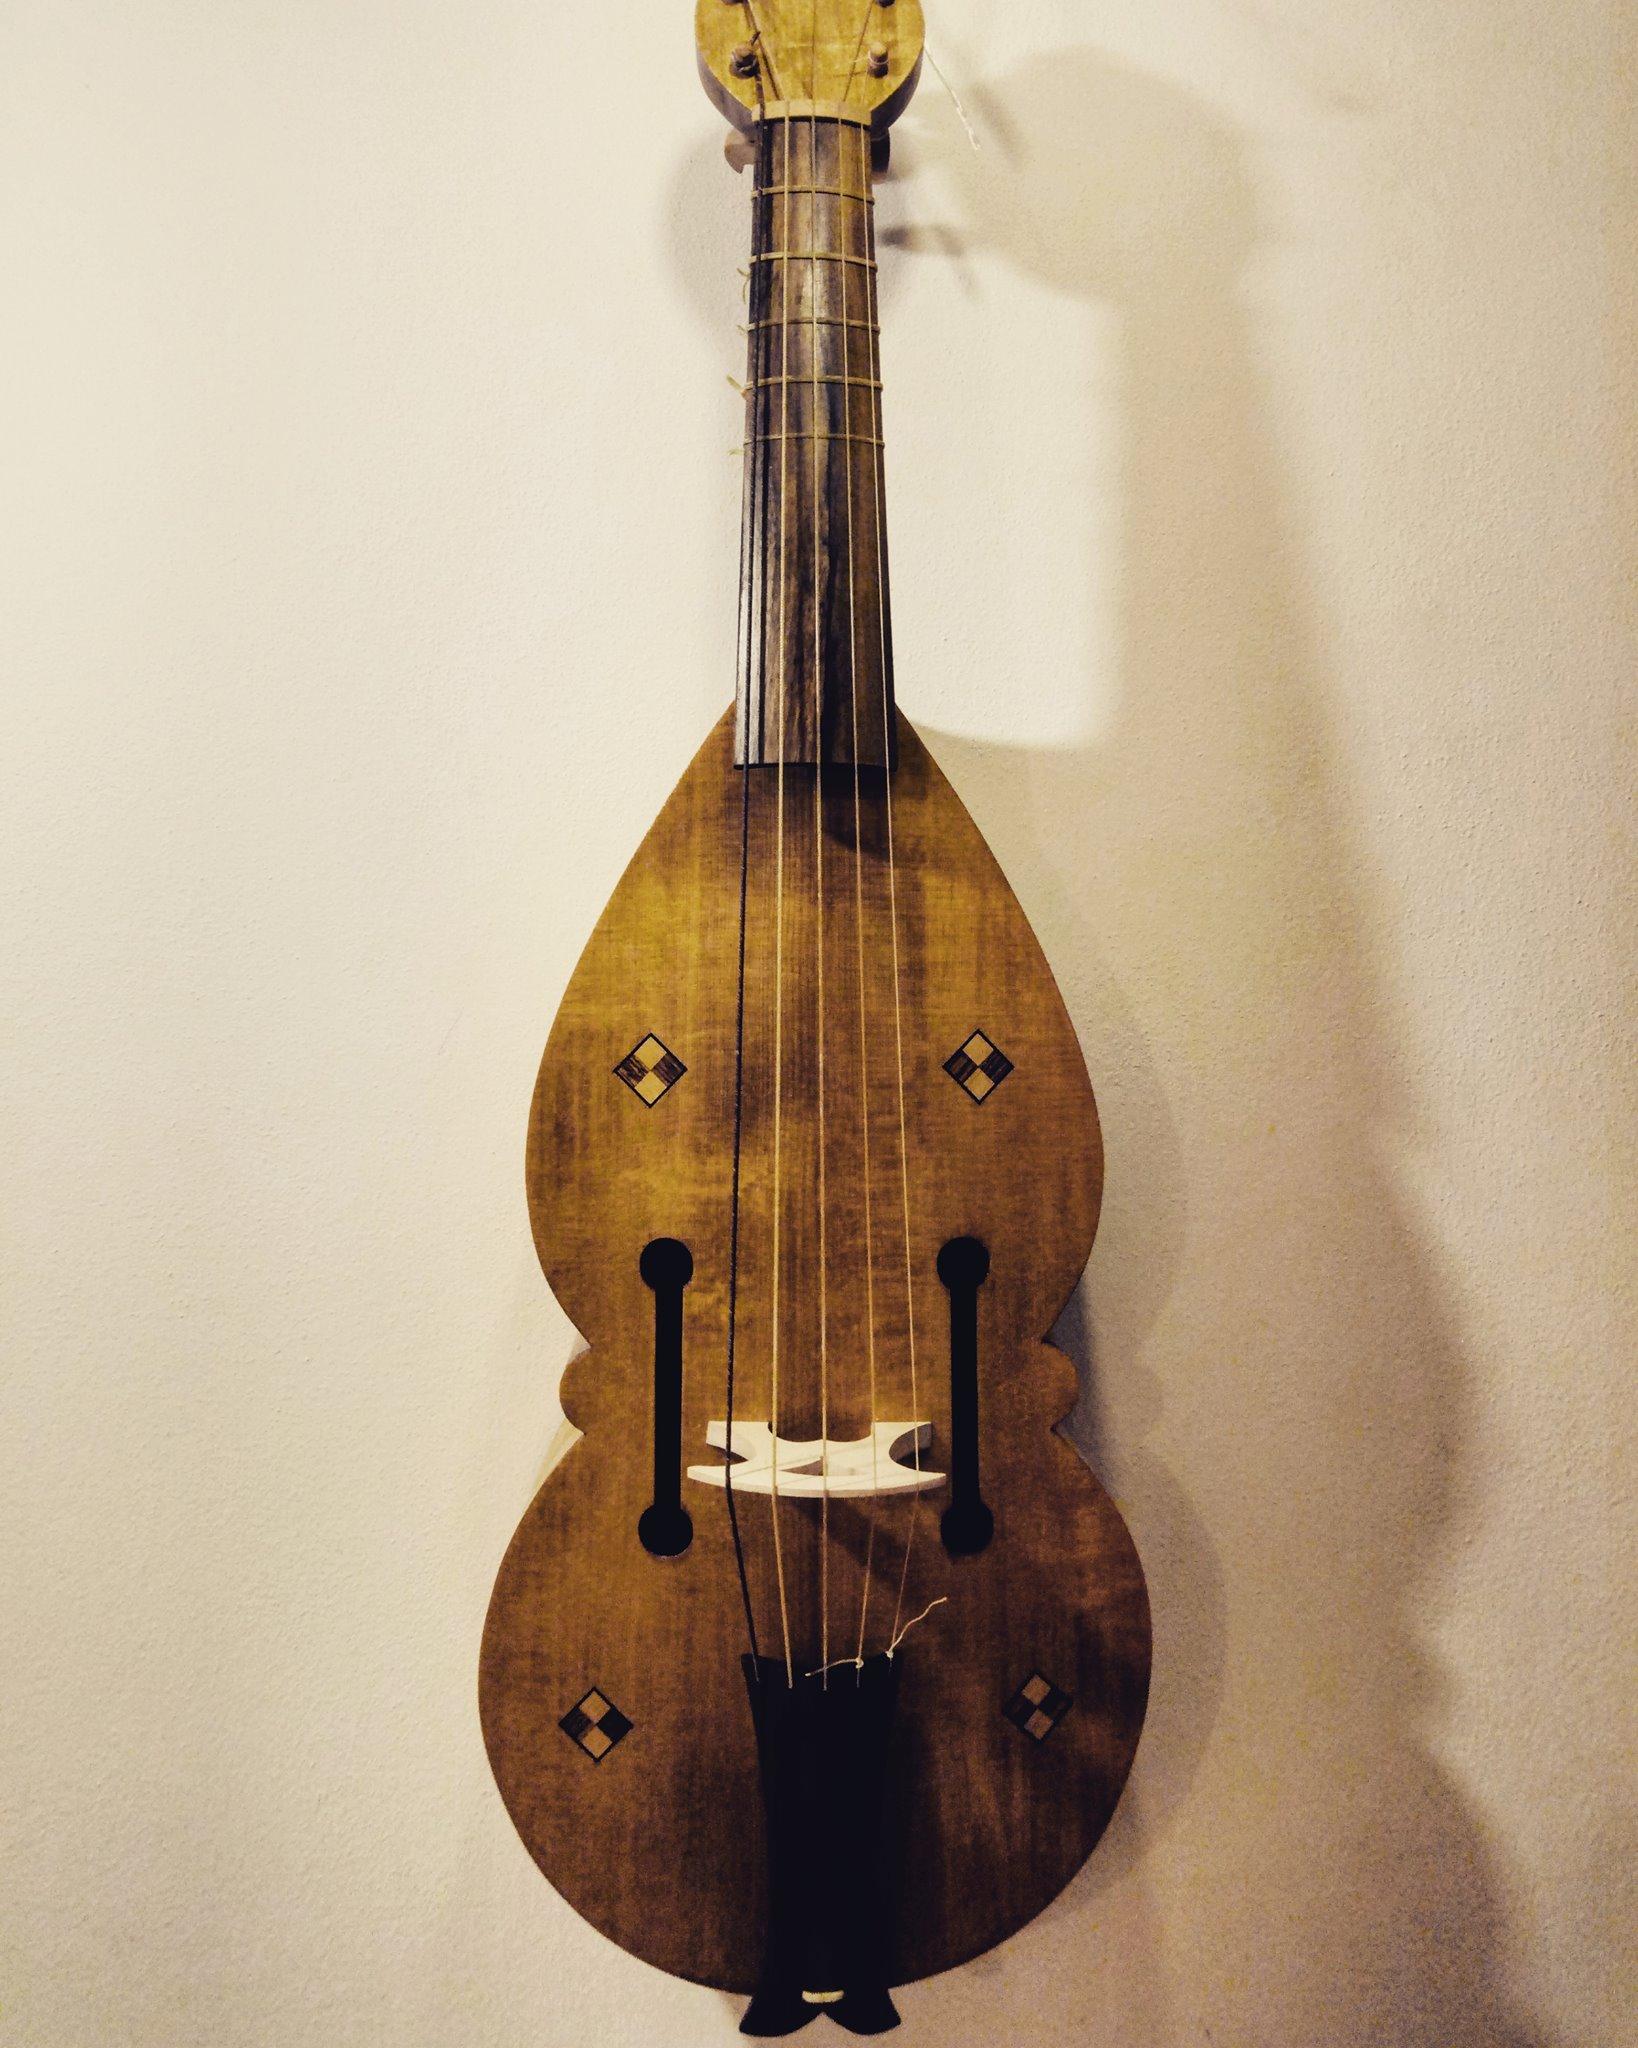 King David Tenor Fiddle  54 cm string length All-gut stringing  €1400